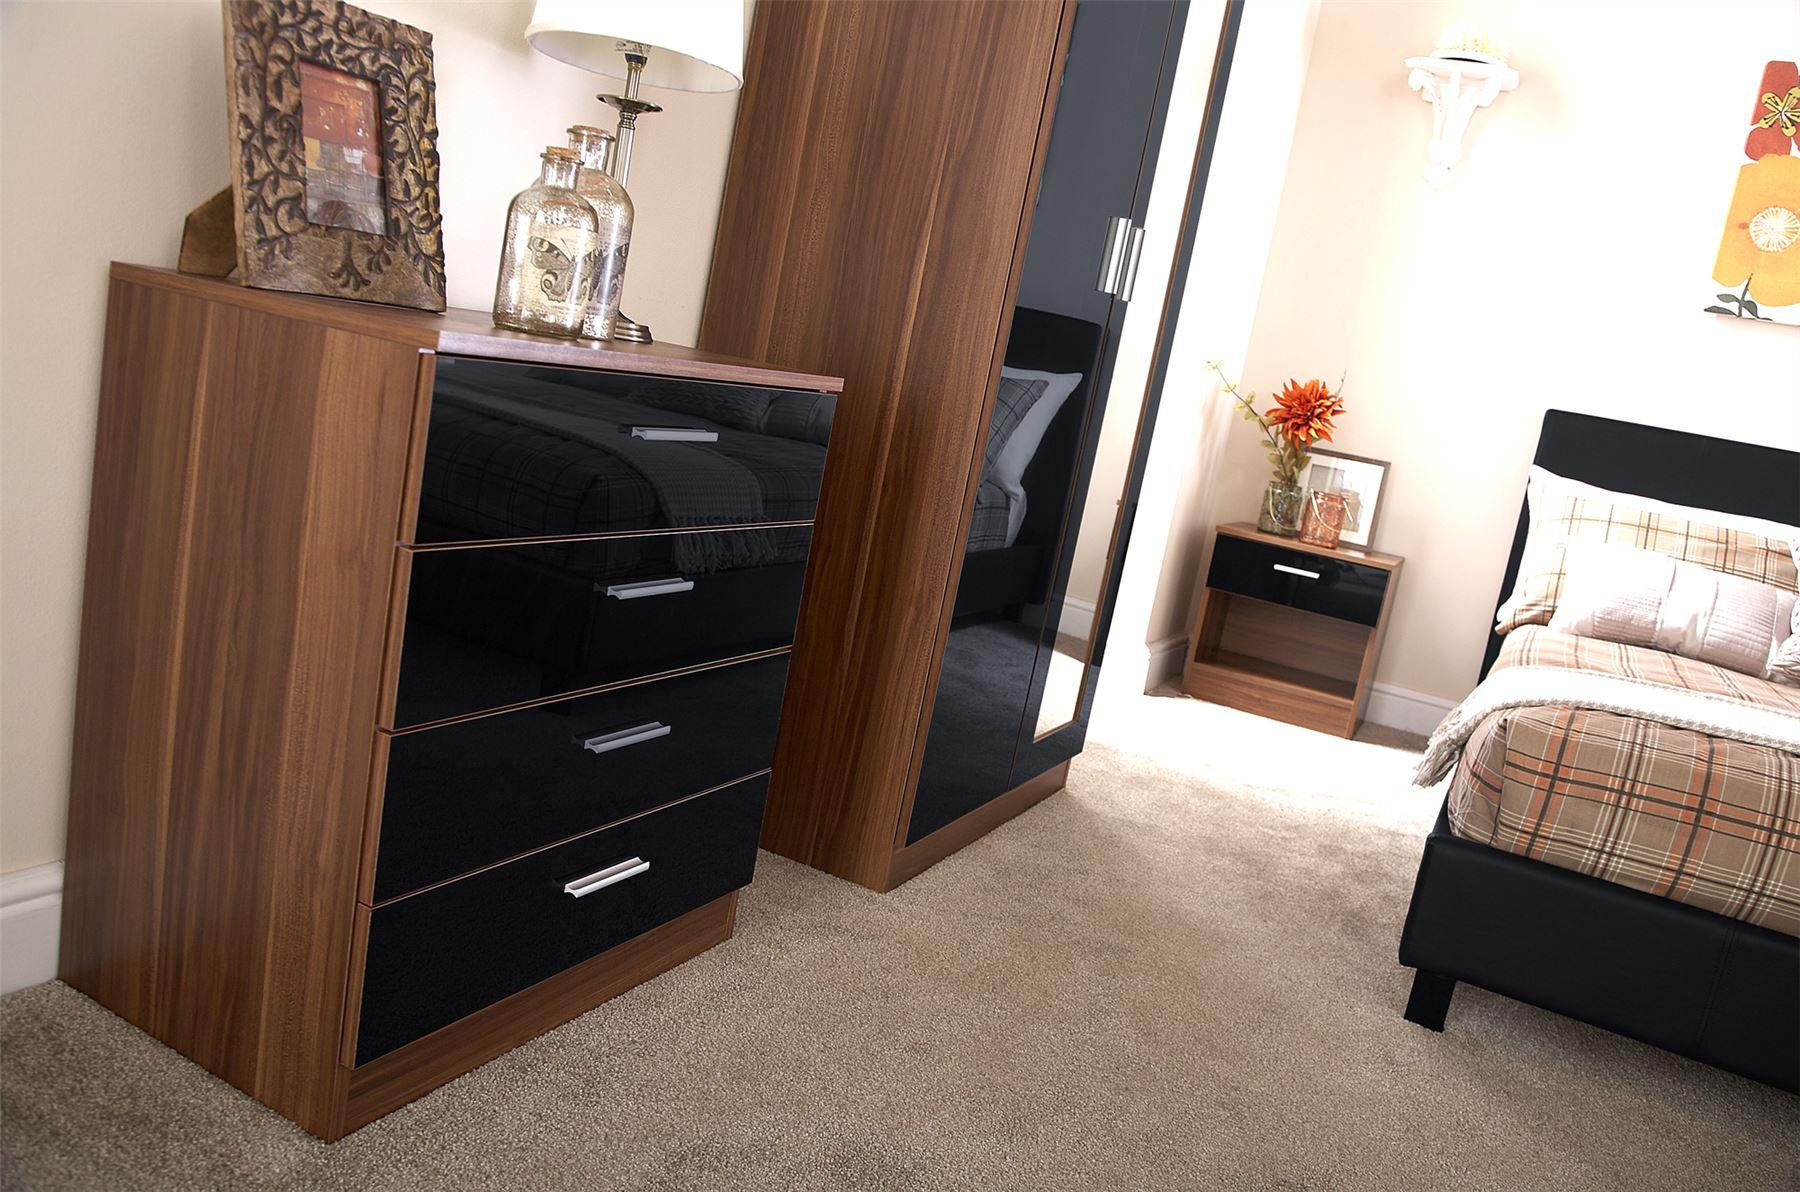 Bedroom Furniture 3 Piece Set Black Gloss Amp Walnut